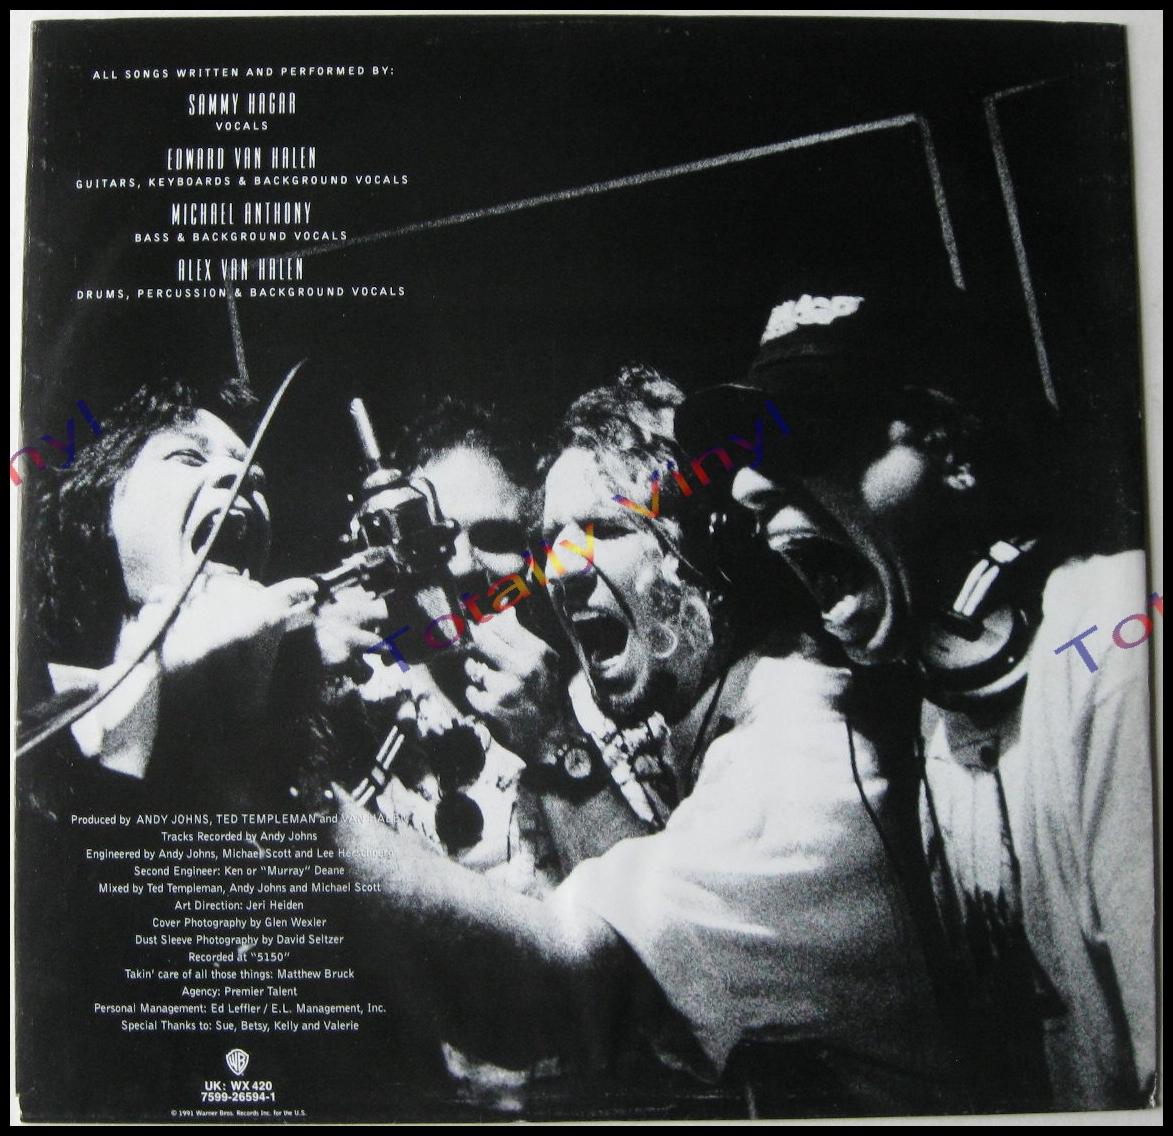 Totally Vinyl Records Van Halen For Unlawful Carnal